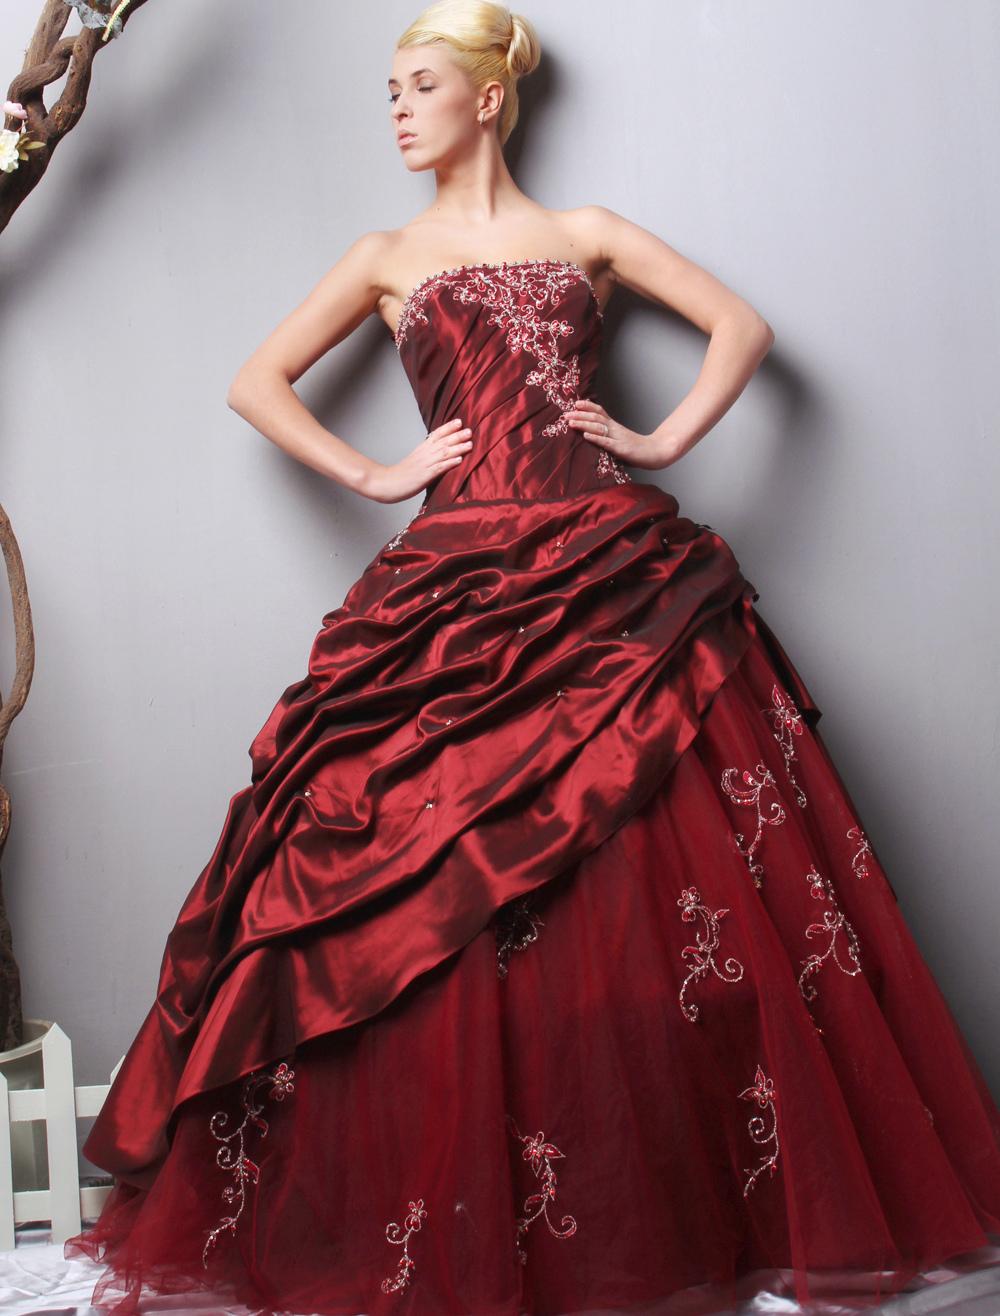 Burgundy Ball Gown Strapless Quinceanera Dress